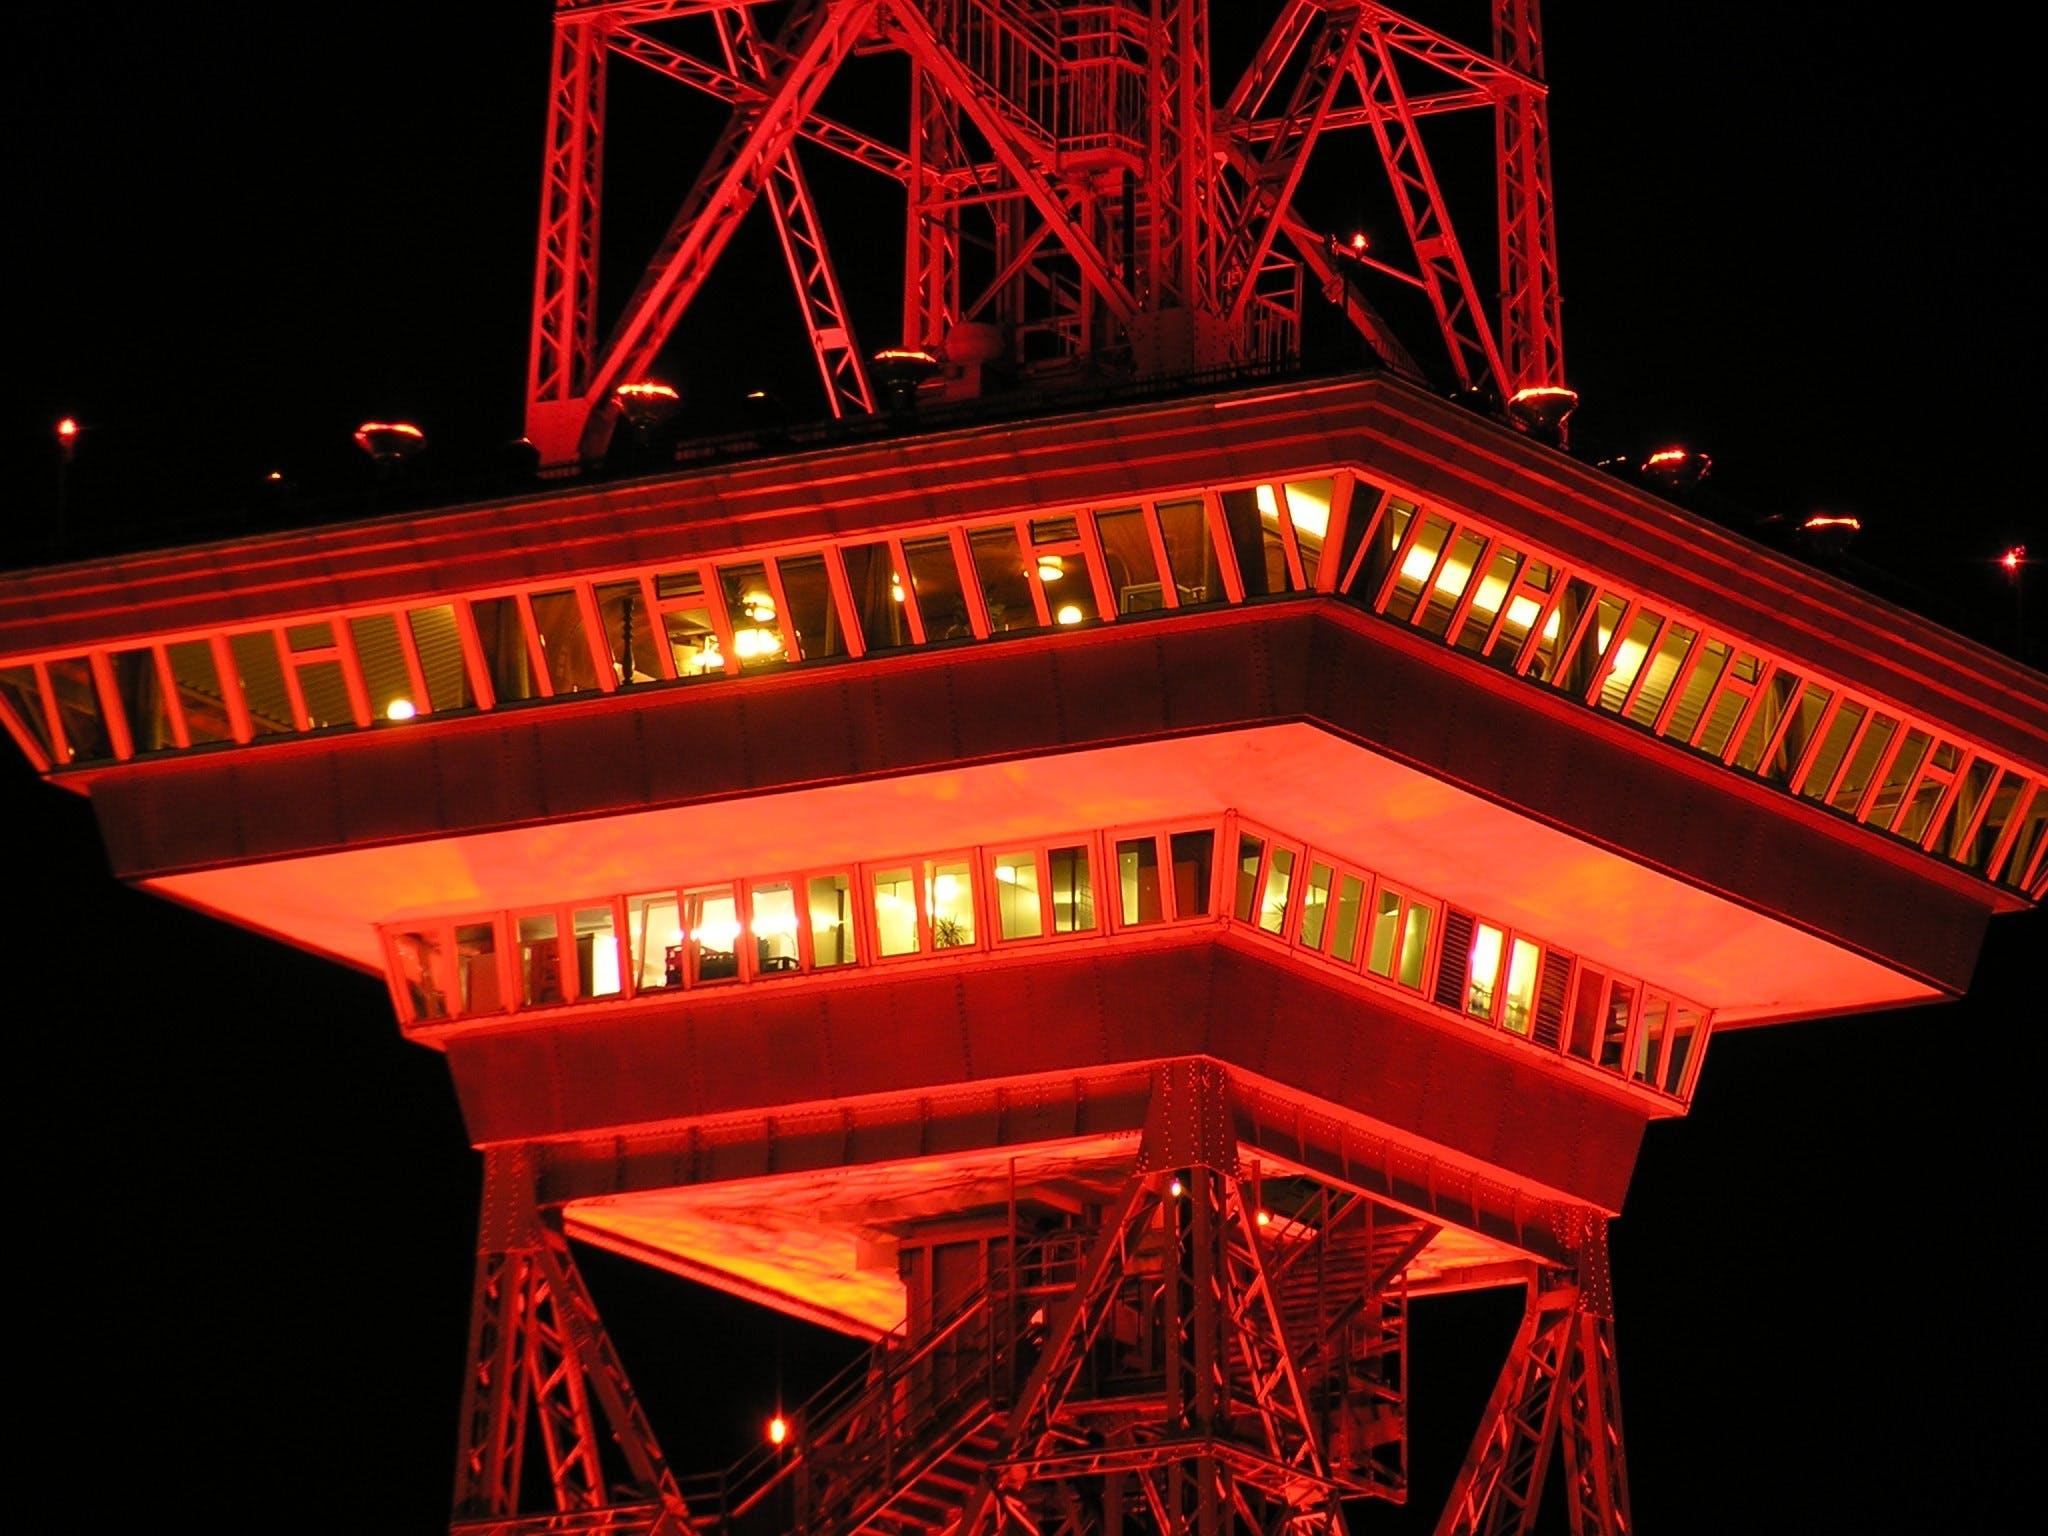 Red Metal Tower at Nighttime